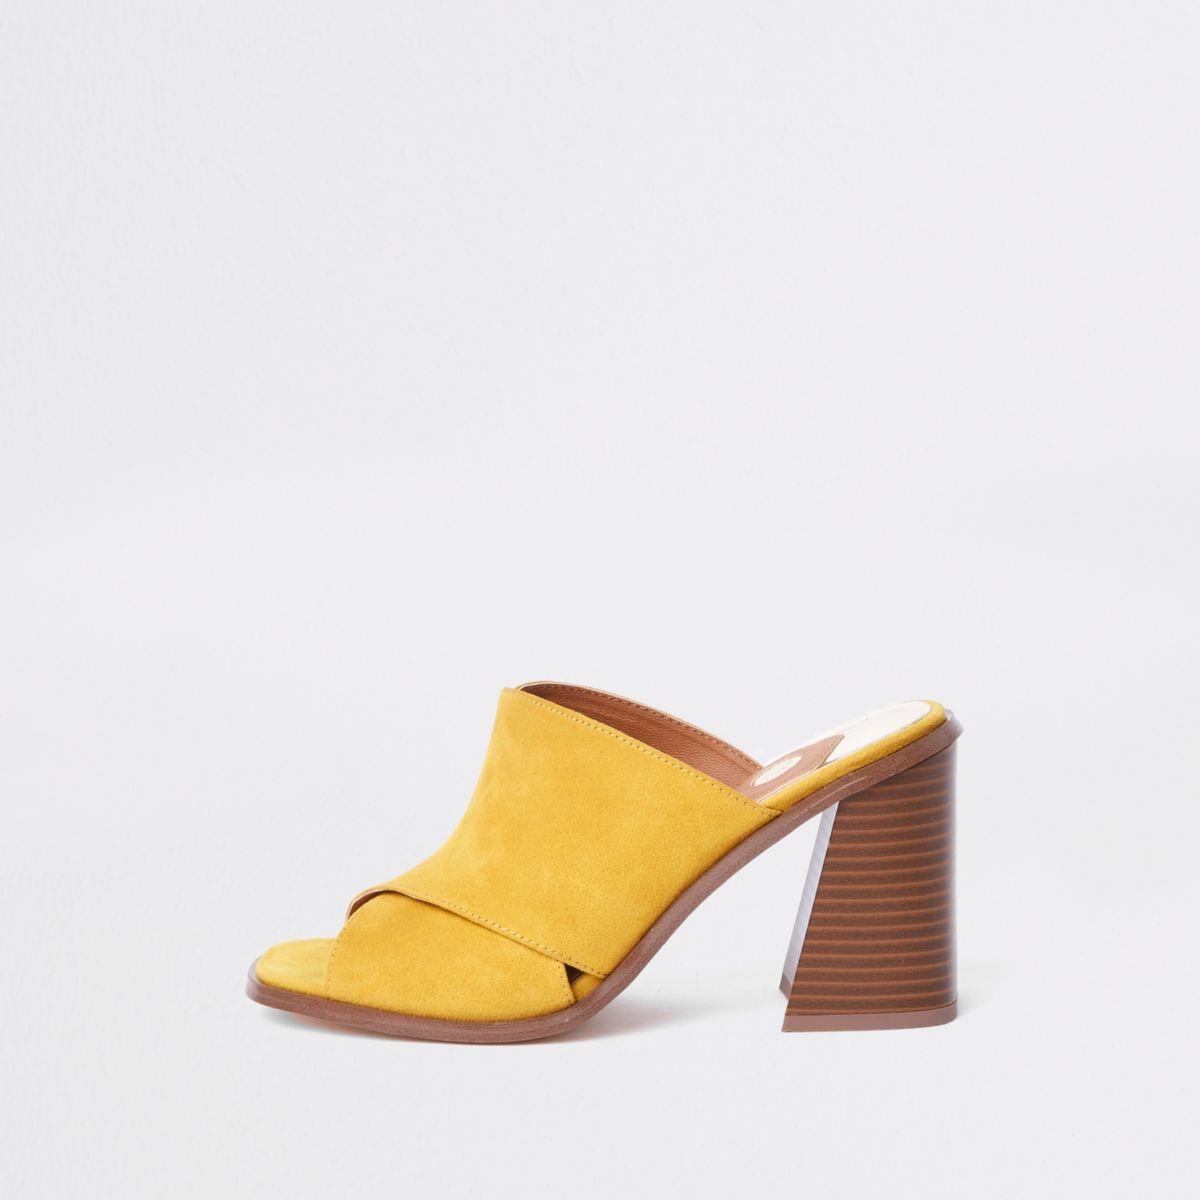 Yellow cross strap block heel mule sandals